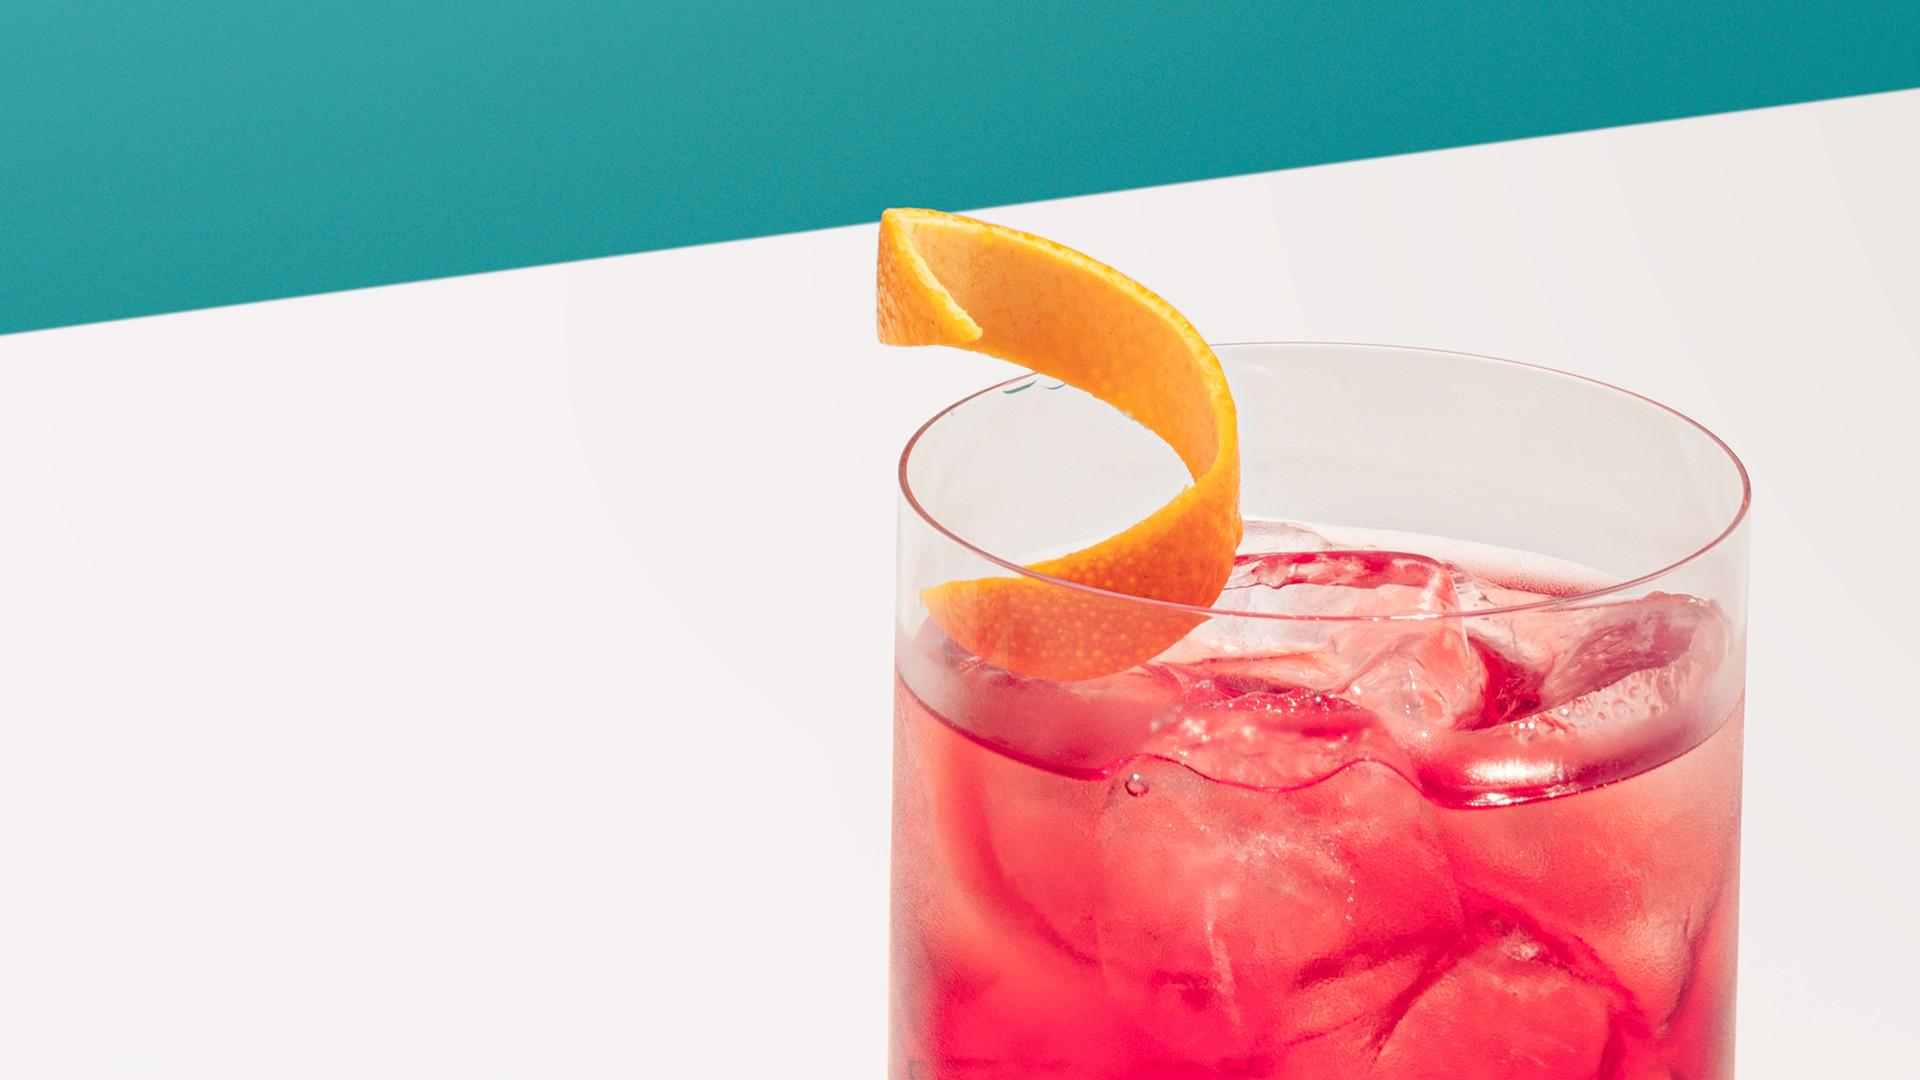 No.3 Gin negroni recipe